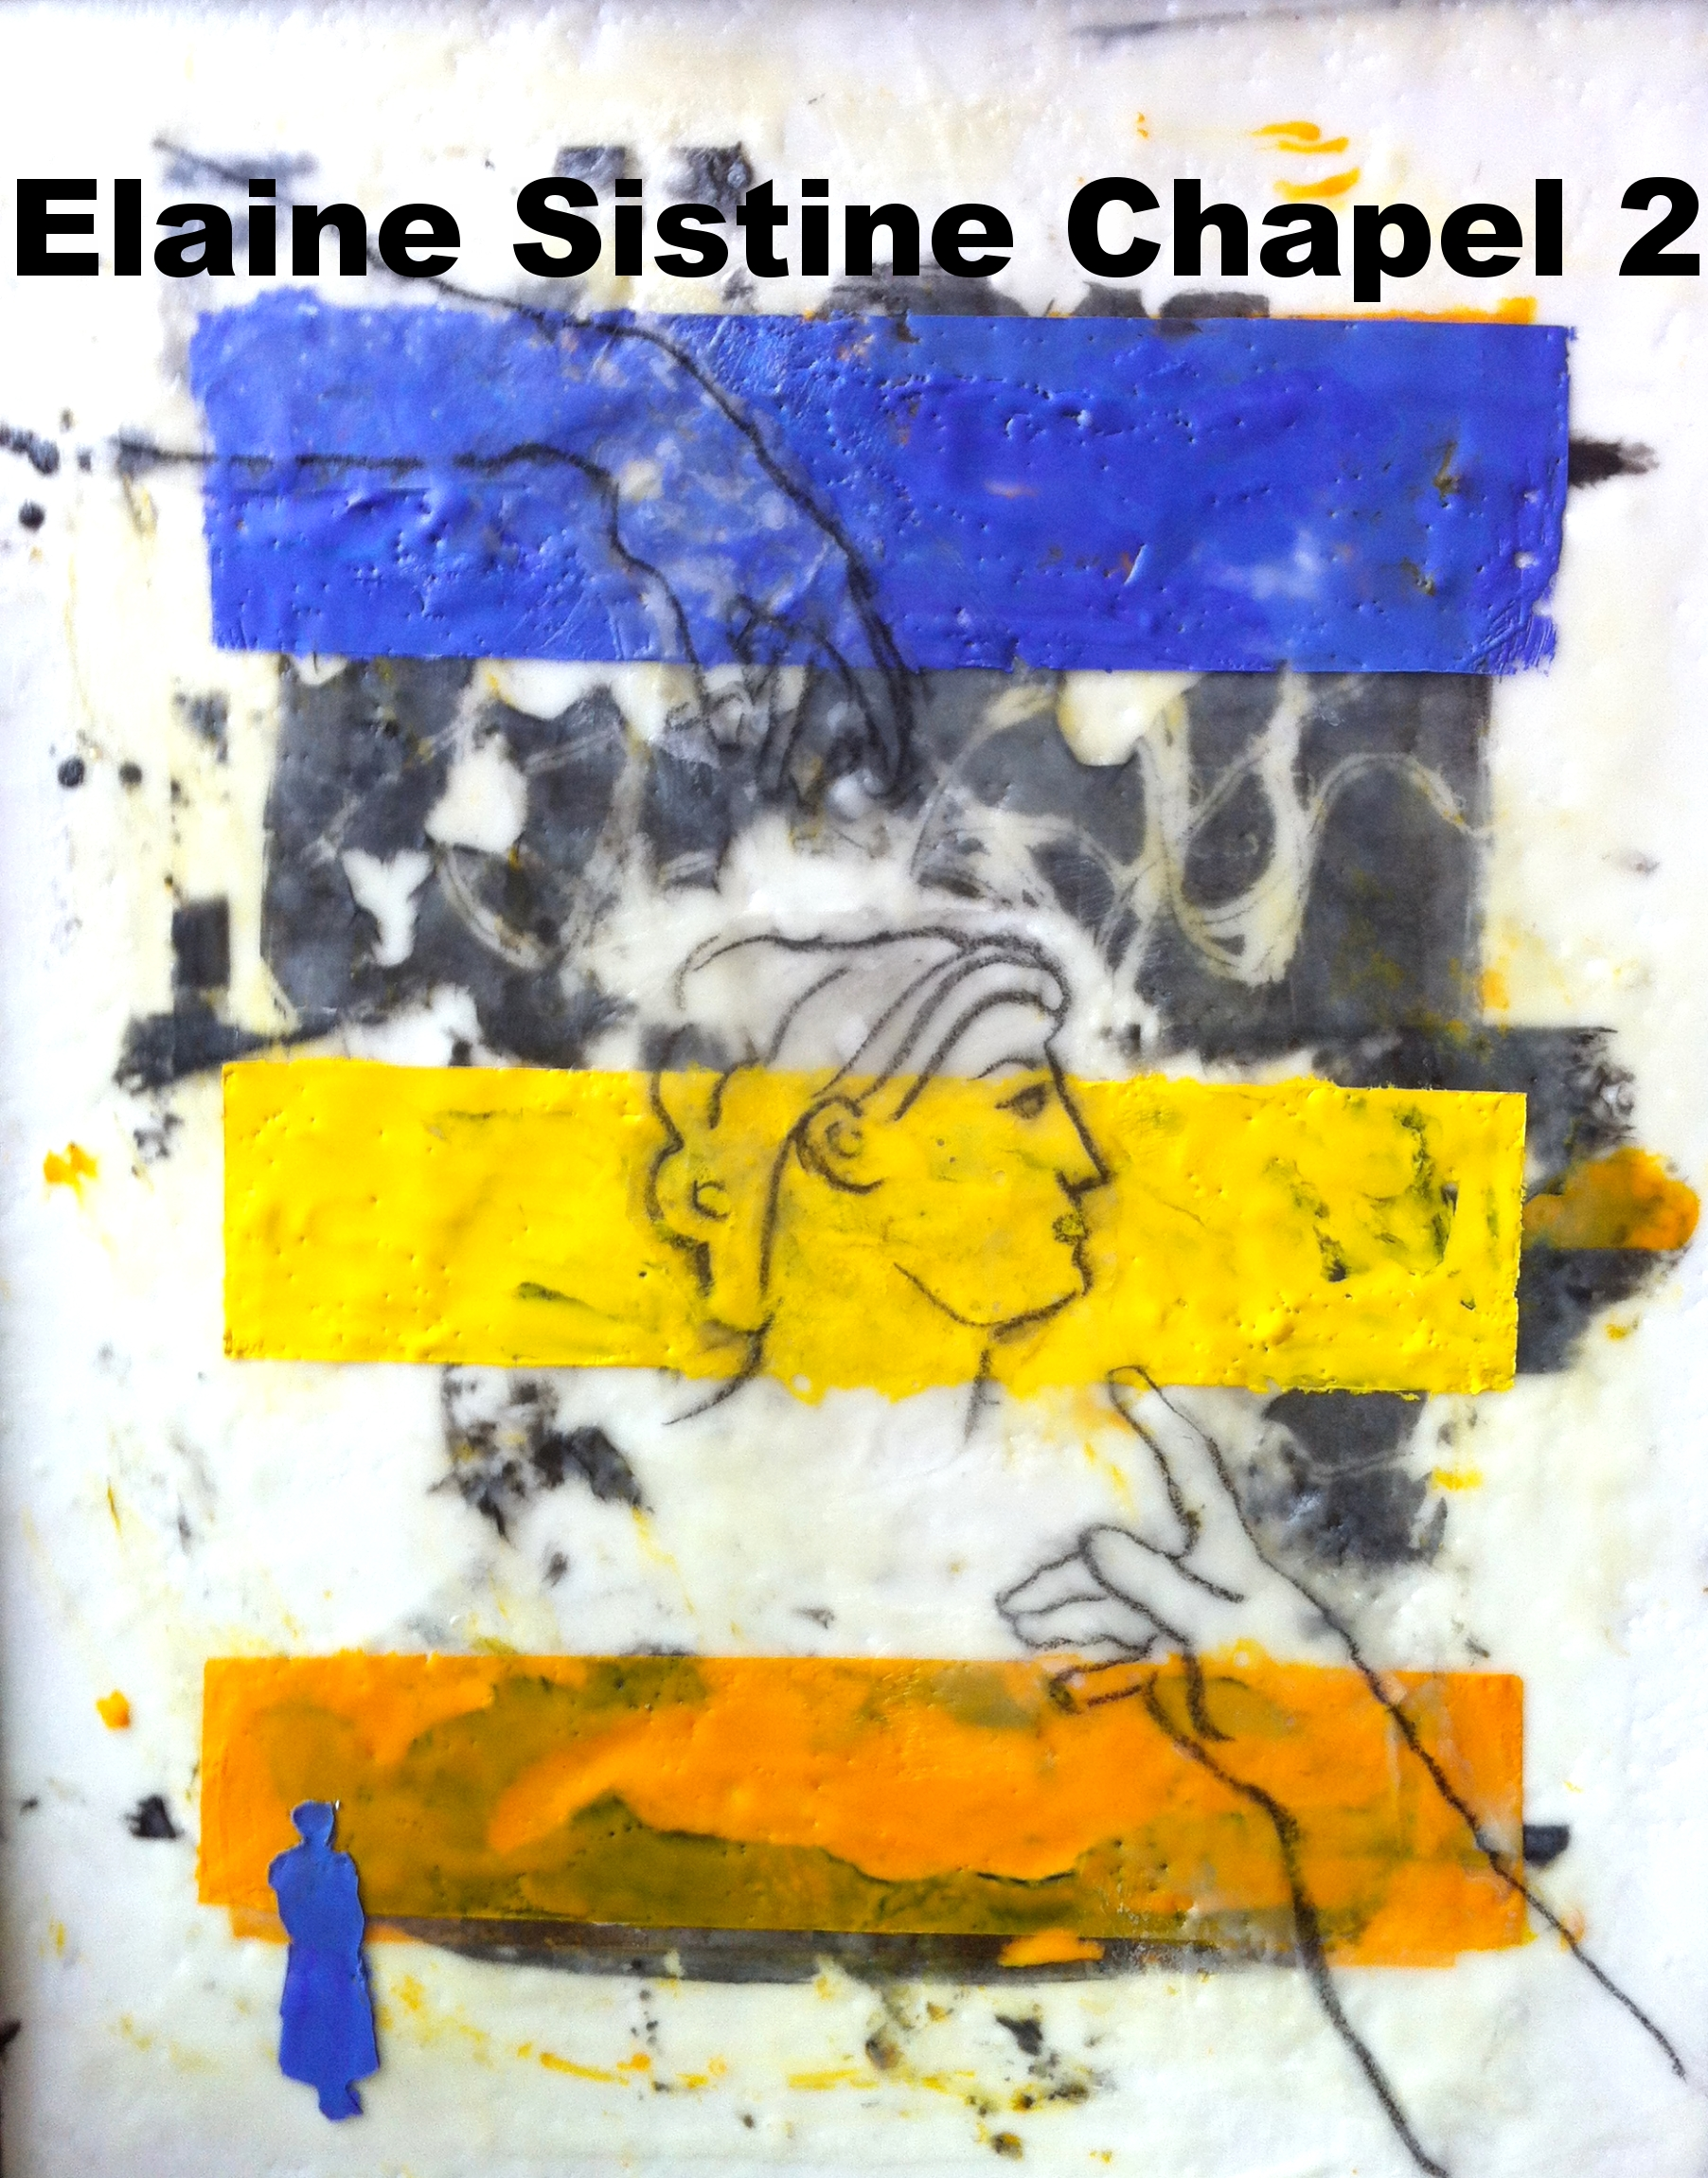 Elaine Sistine Chapel 2013